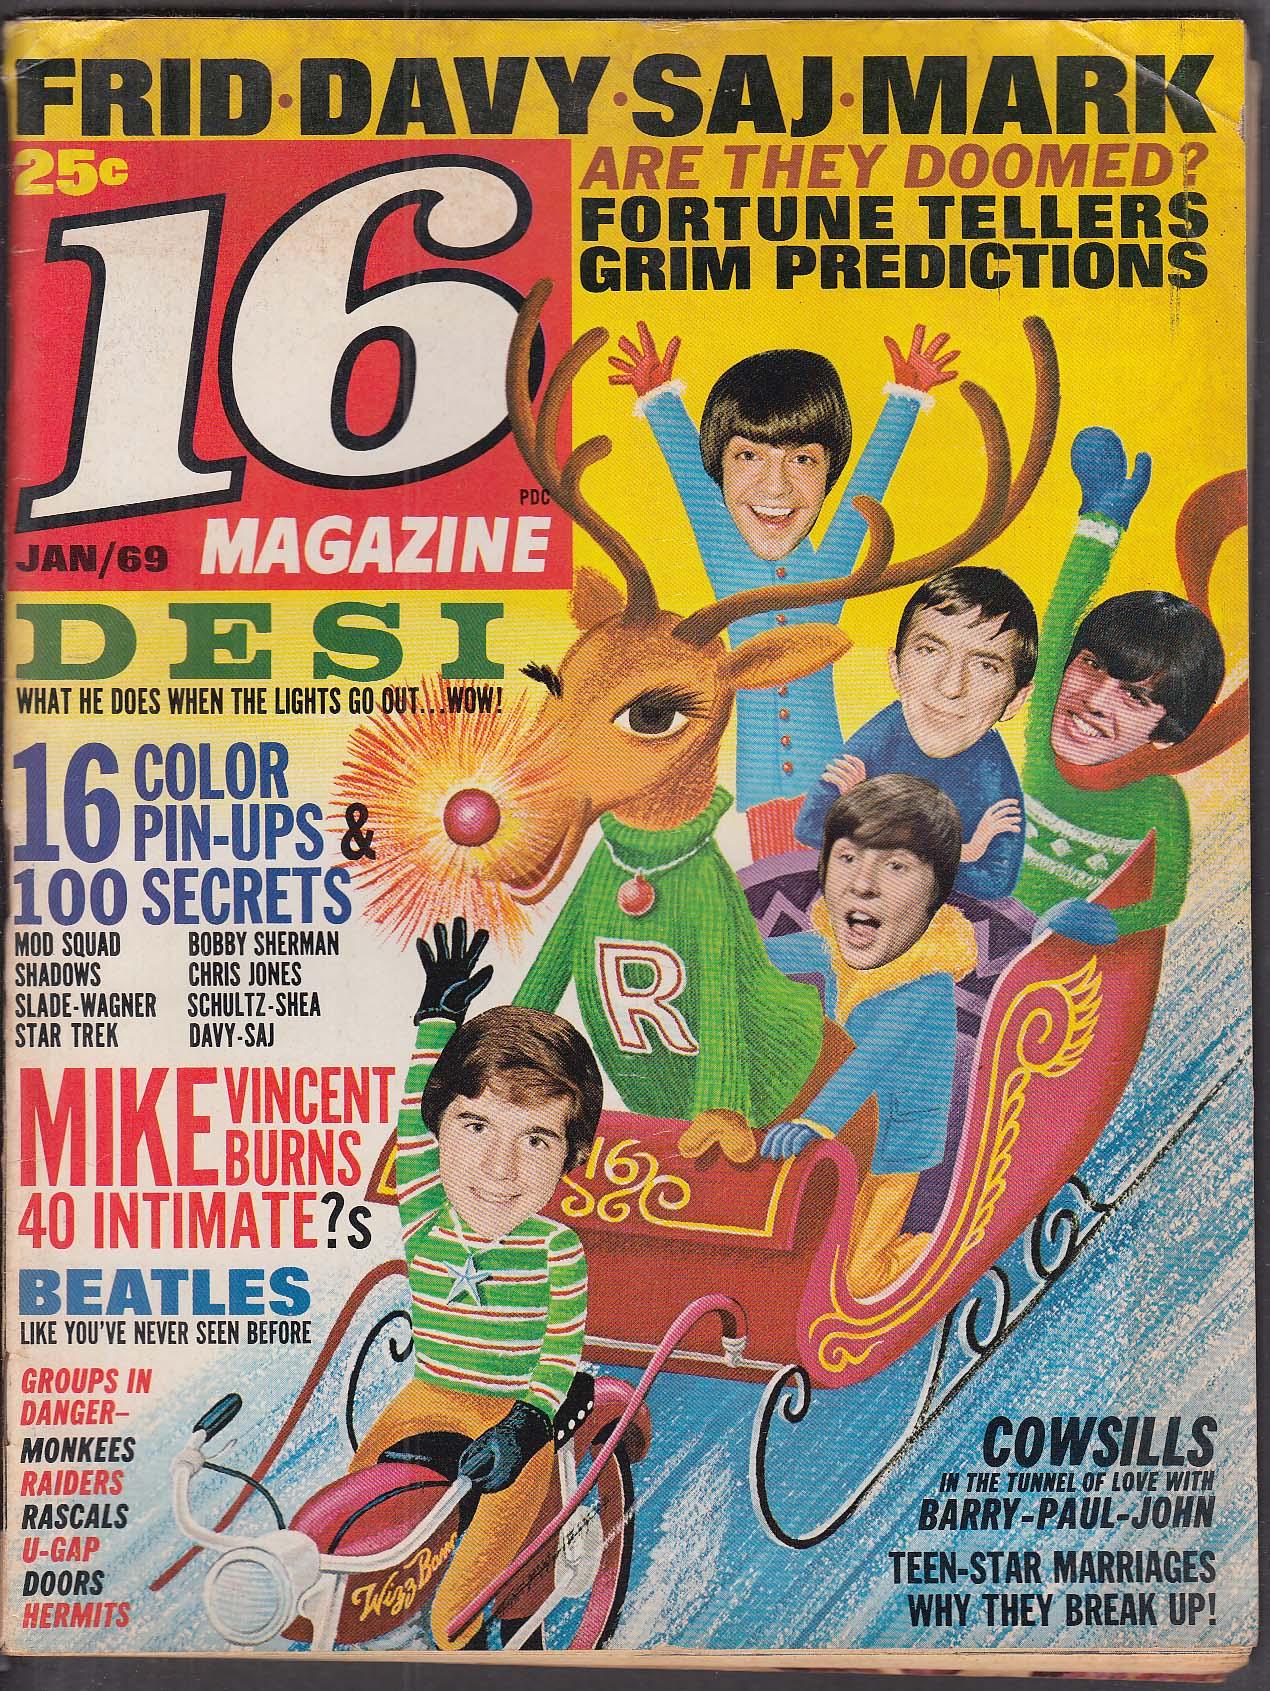 16 Desi Davy Jones Saj Monkees Bobby Sherman Chris Jones Cowsills Beatles 1 1969